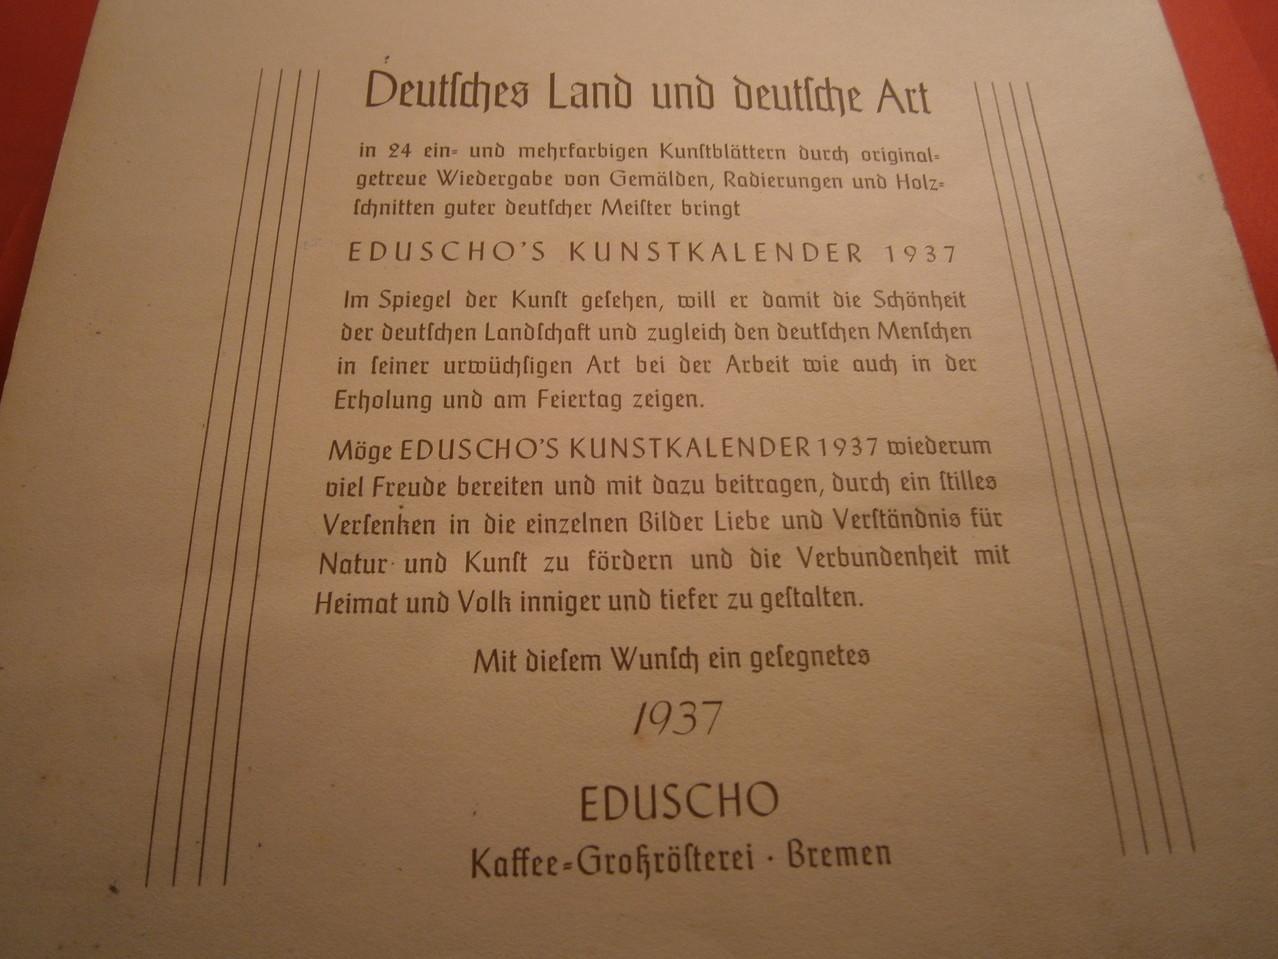 Eduscho Kunstkalender 1937